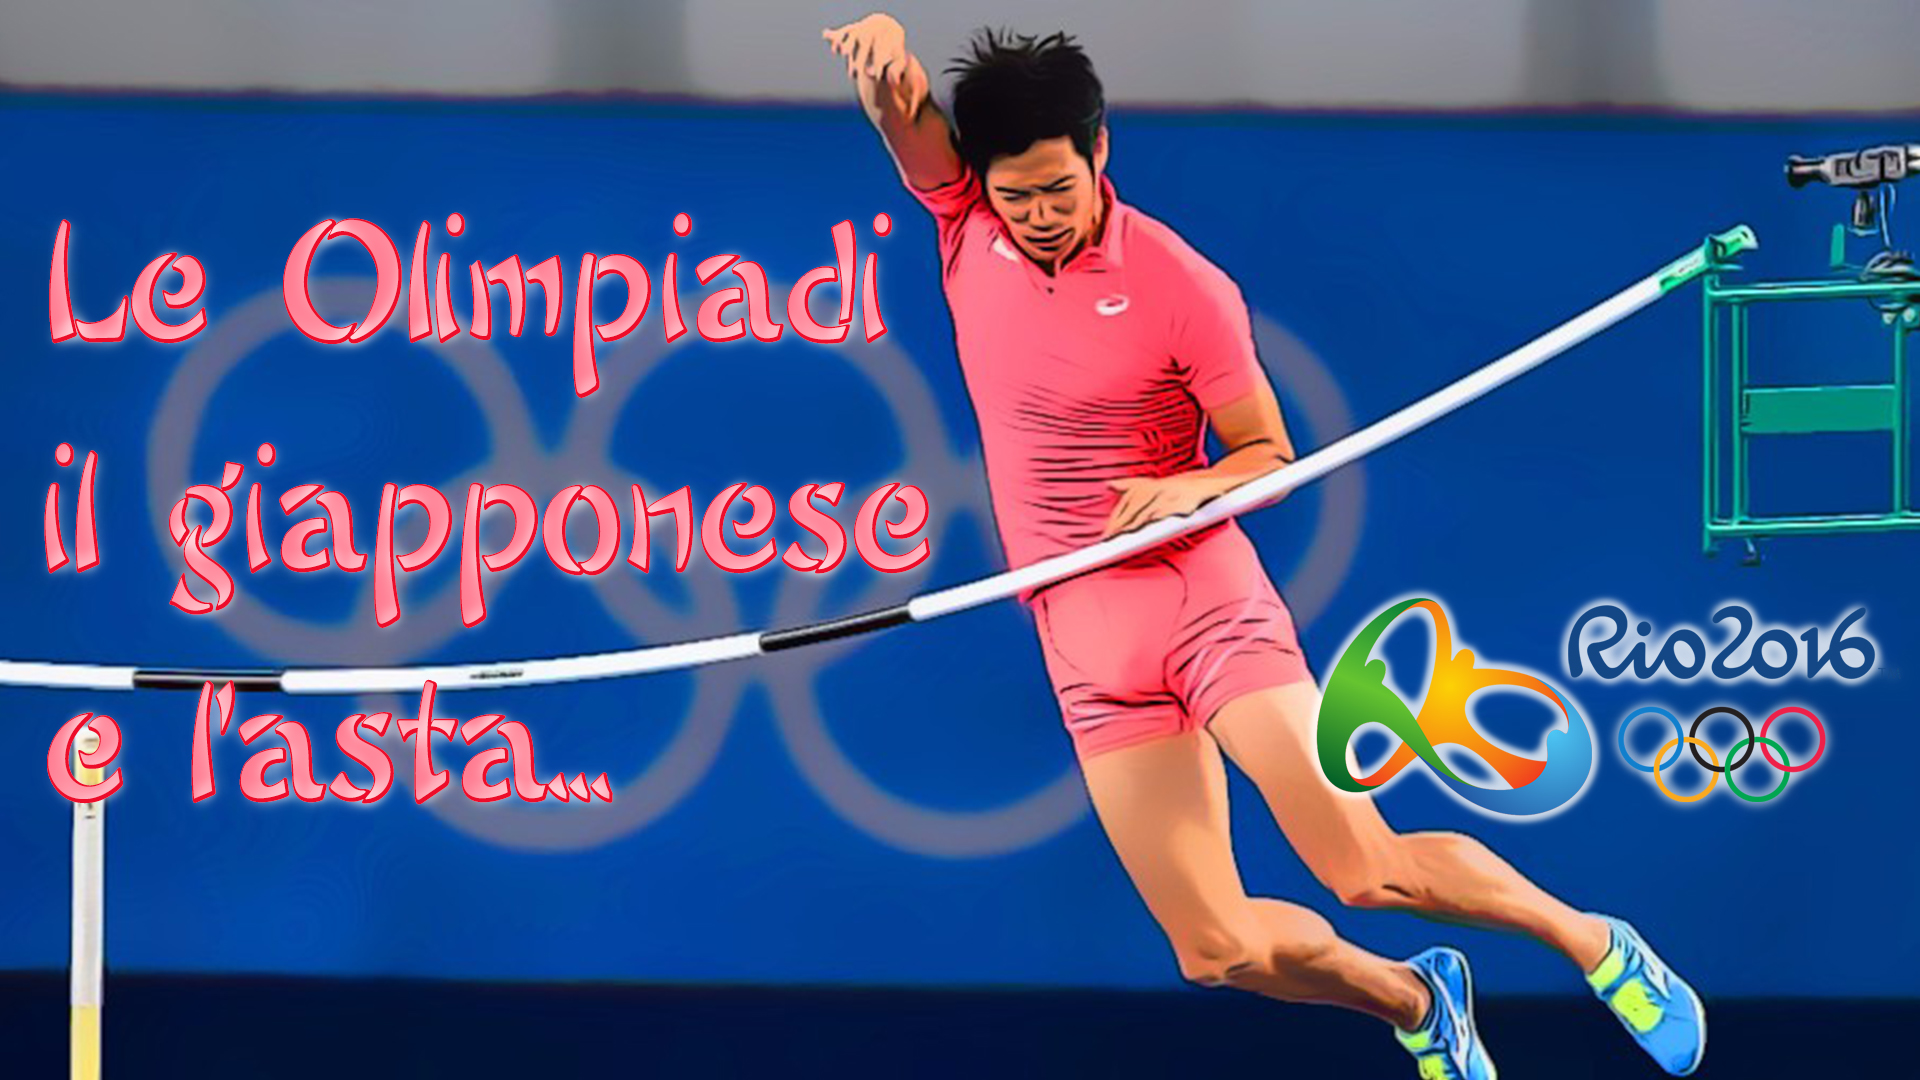 Le-Olimpiadi-il-giapponese-e-lasta... Vari